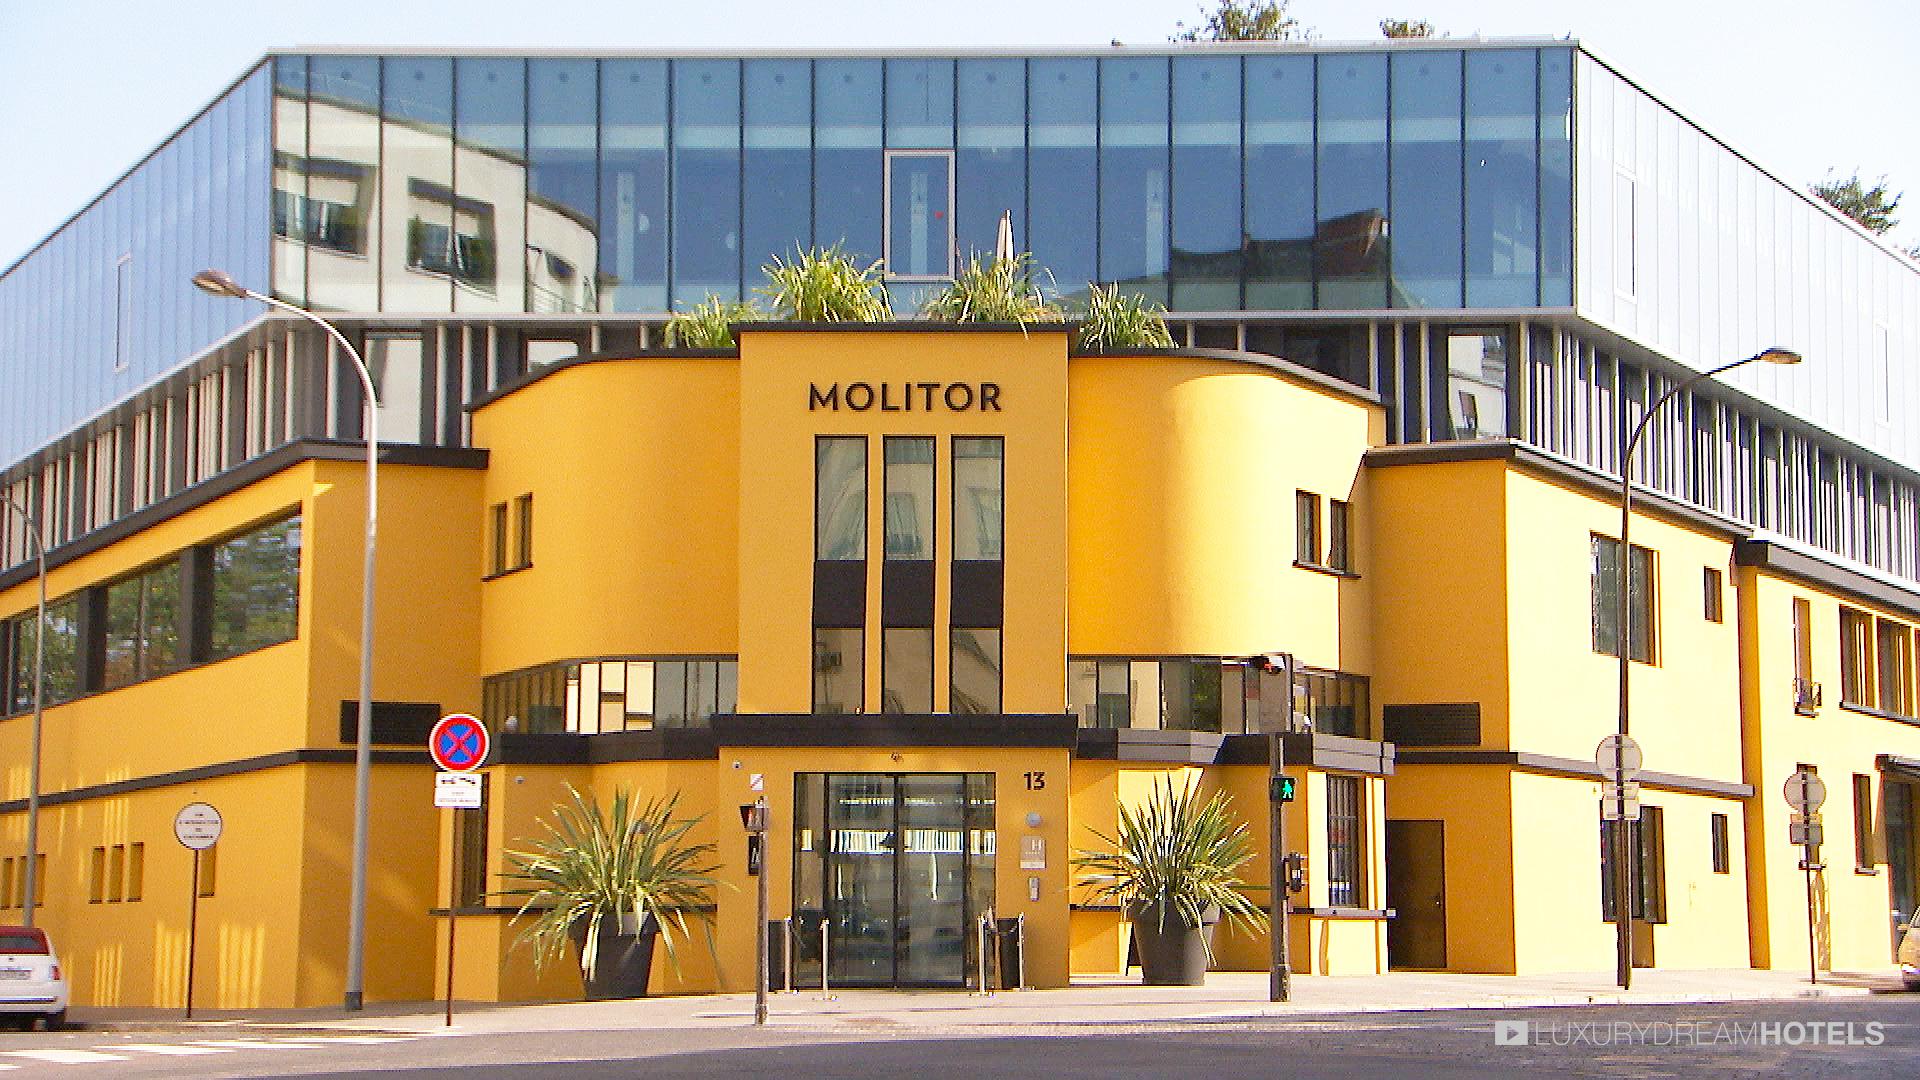 Hotel Molitor Paris By Alain Derbesse Architects – Bar Furniture avec Piscine Molitor Restaurant